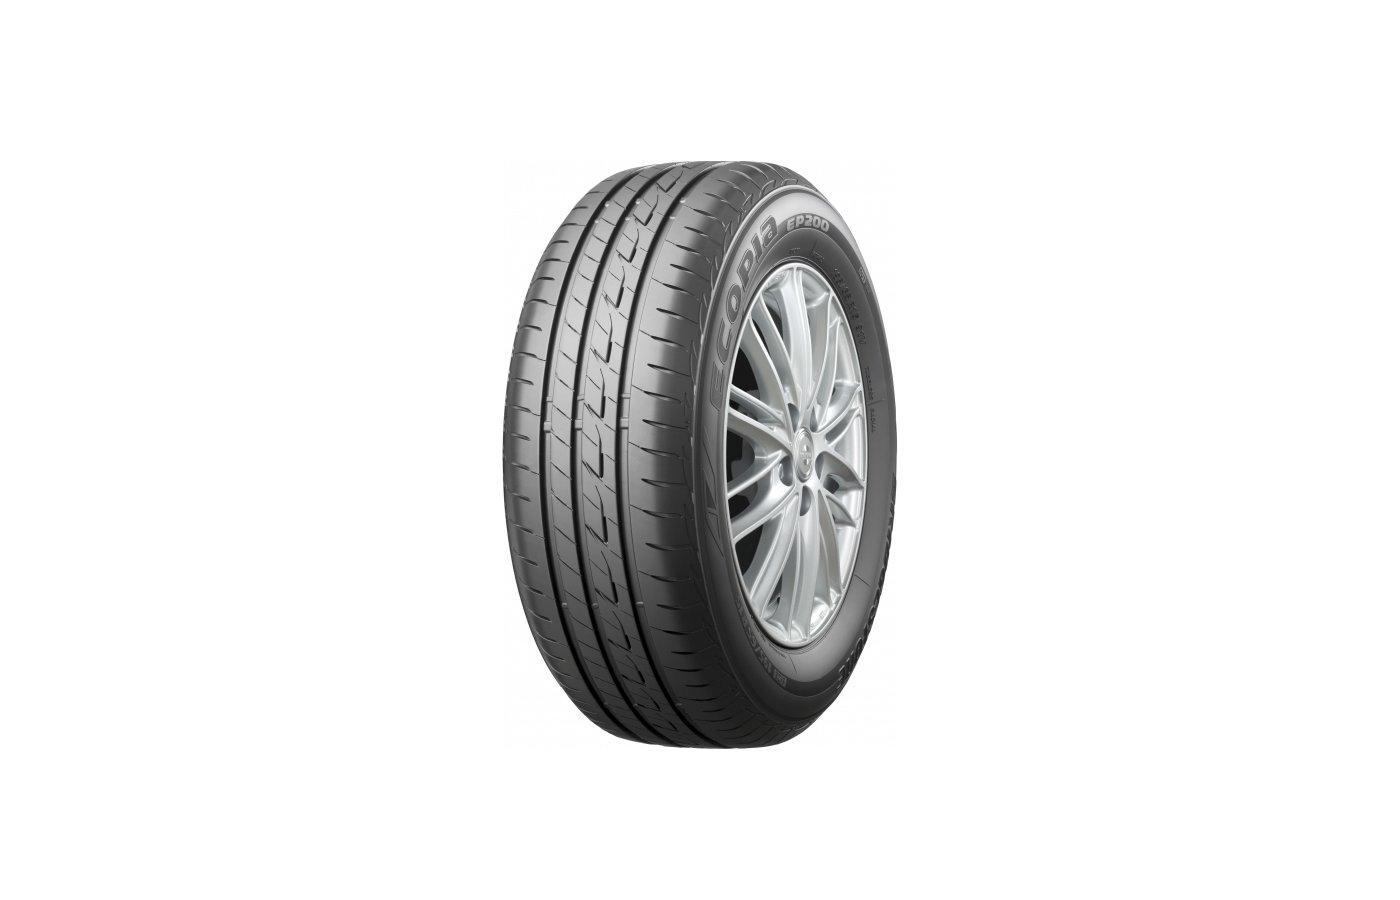 Шина Bridgestone Ecopia EP200 225/45 R17 TL 91V